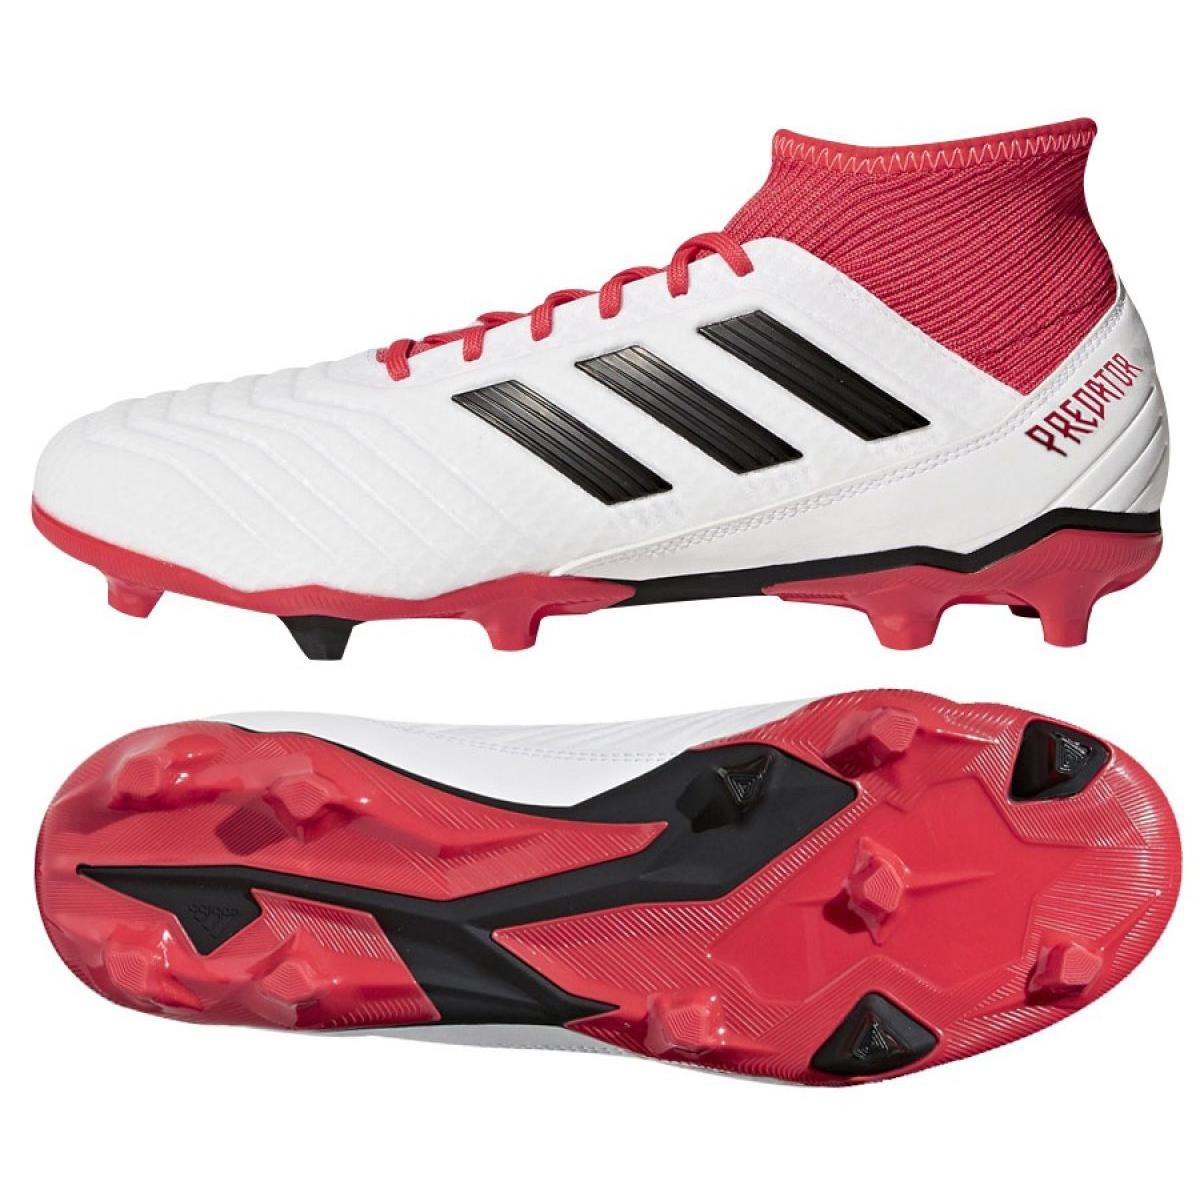 Football bottes adidas Prougeator 18.3 Fg M CM7667